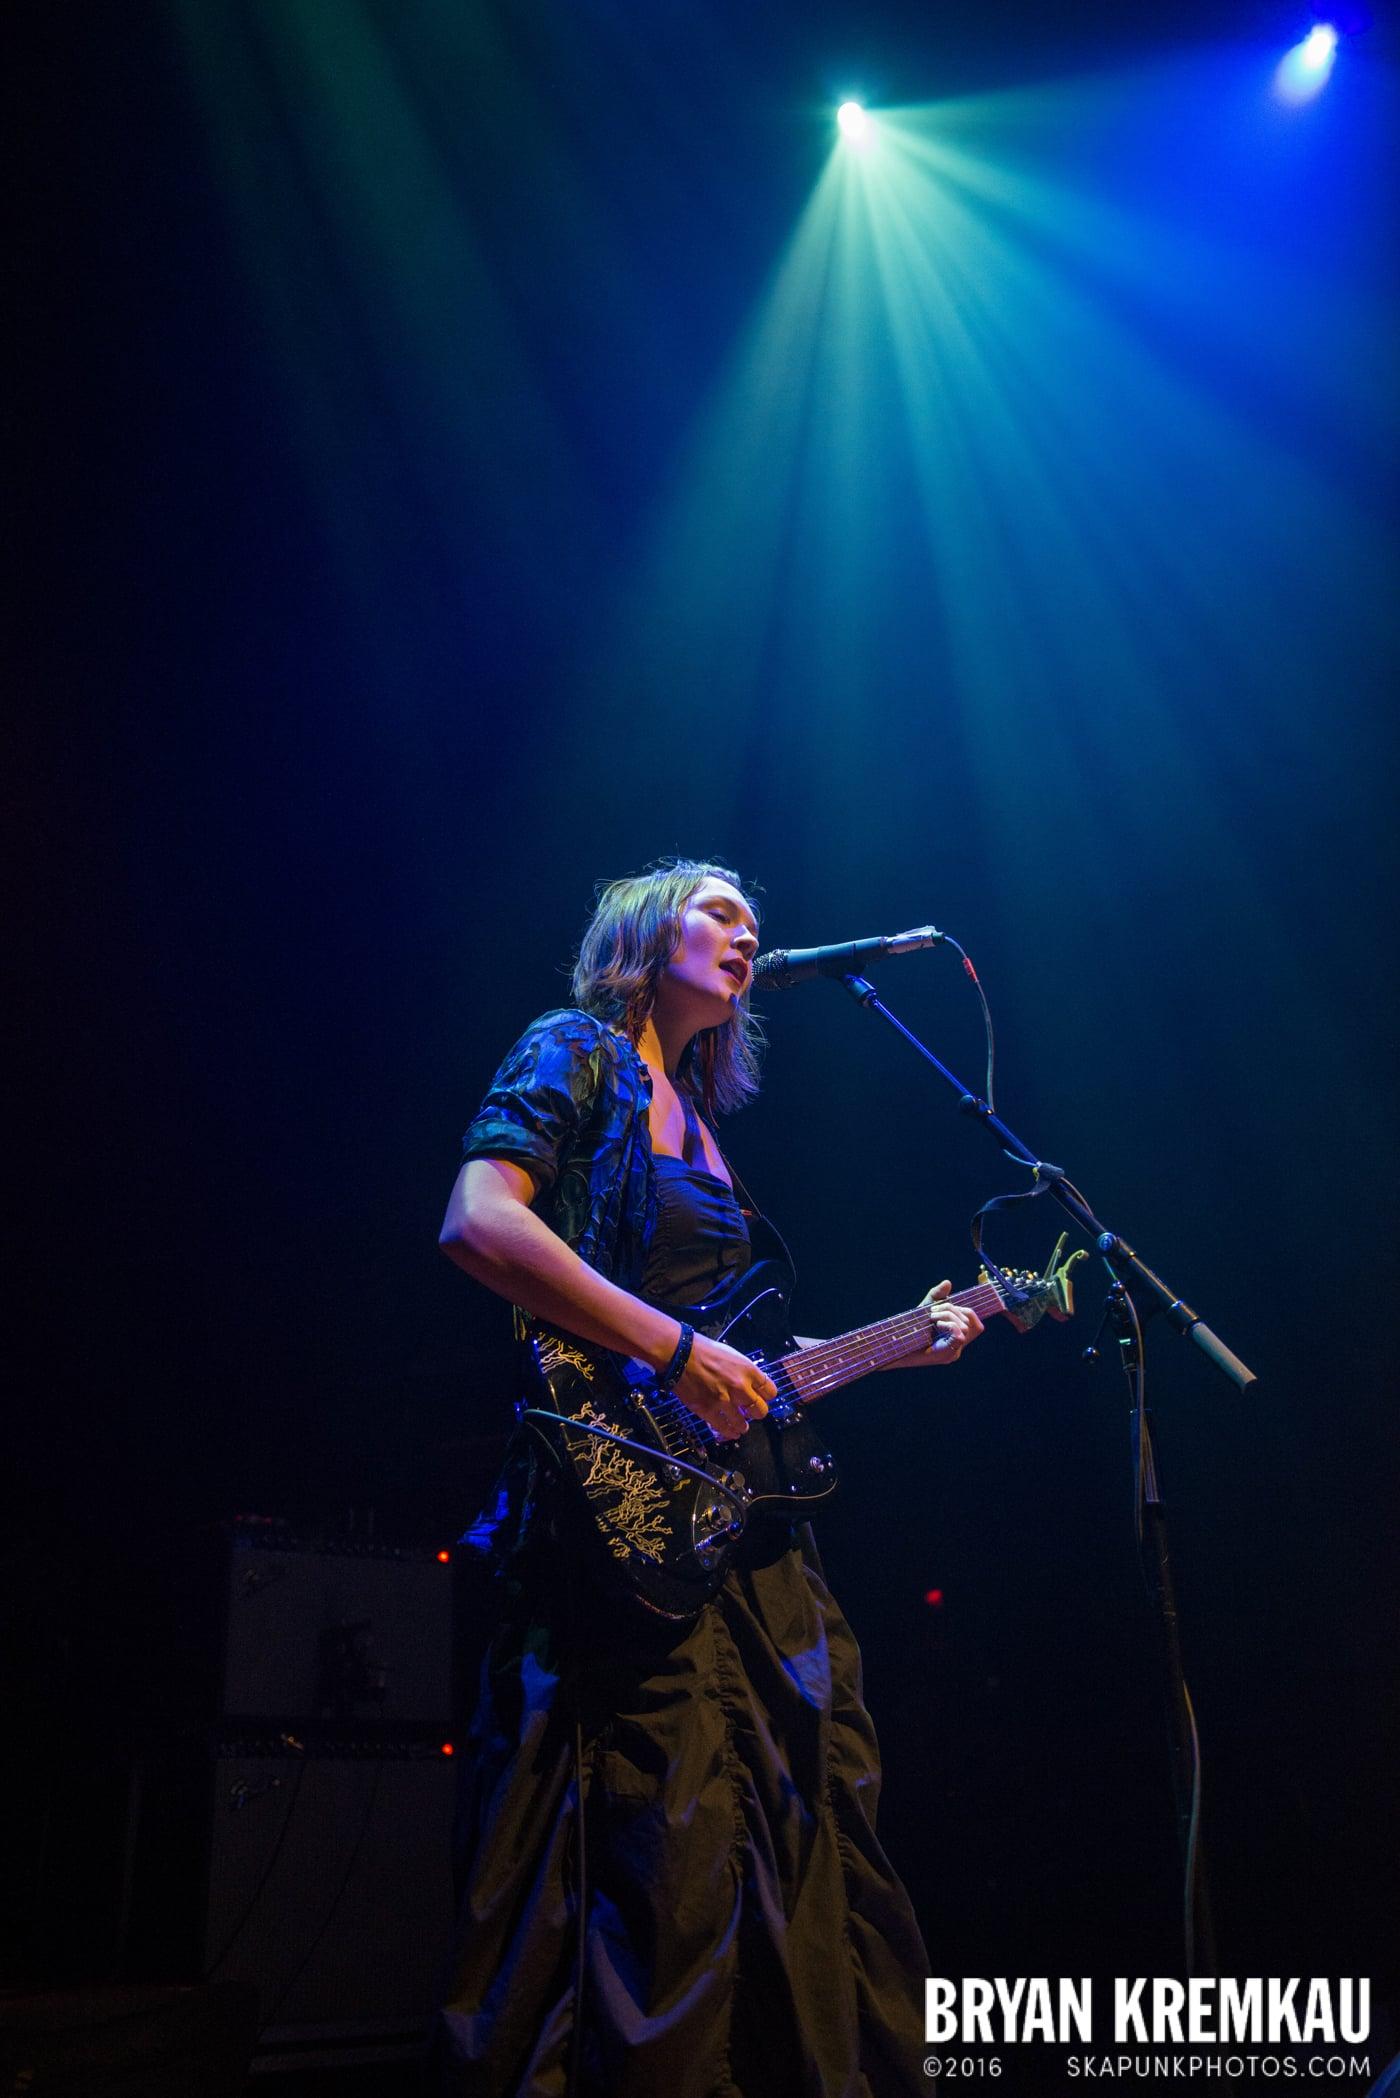 Meredith Sheldon @ Gramercy Theatre, NYC - 11.12.14 (11)